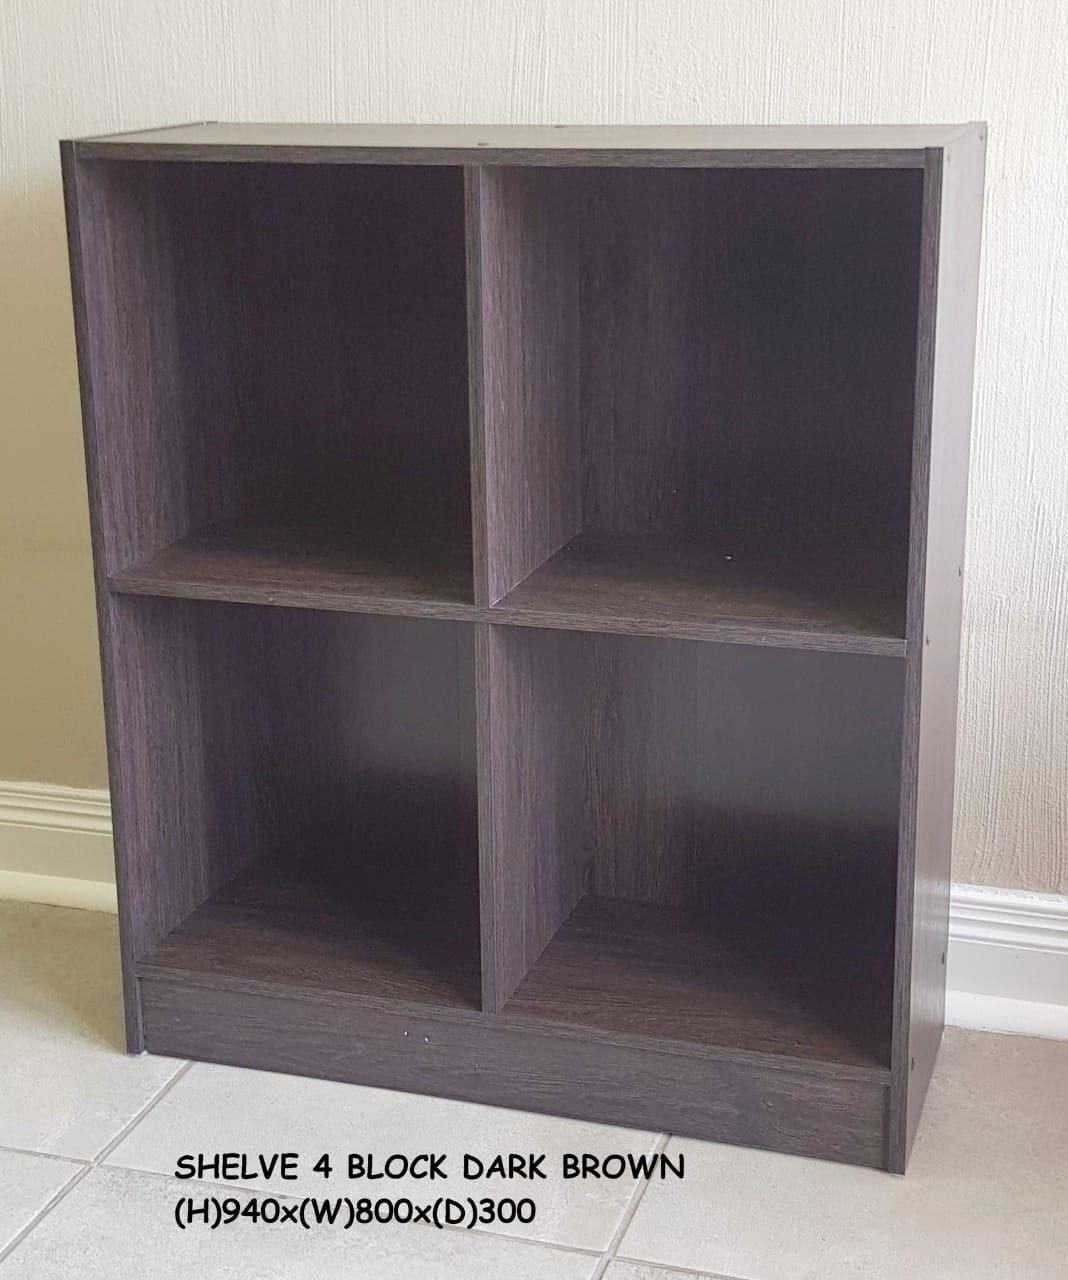 bookshelf 4 block